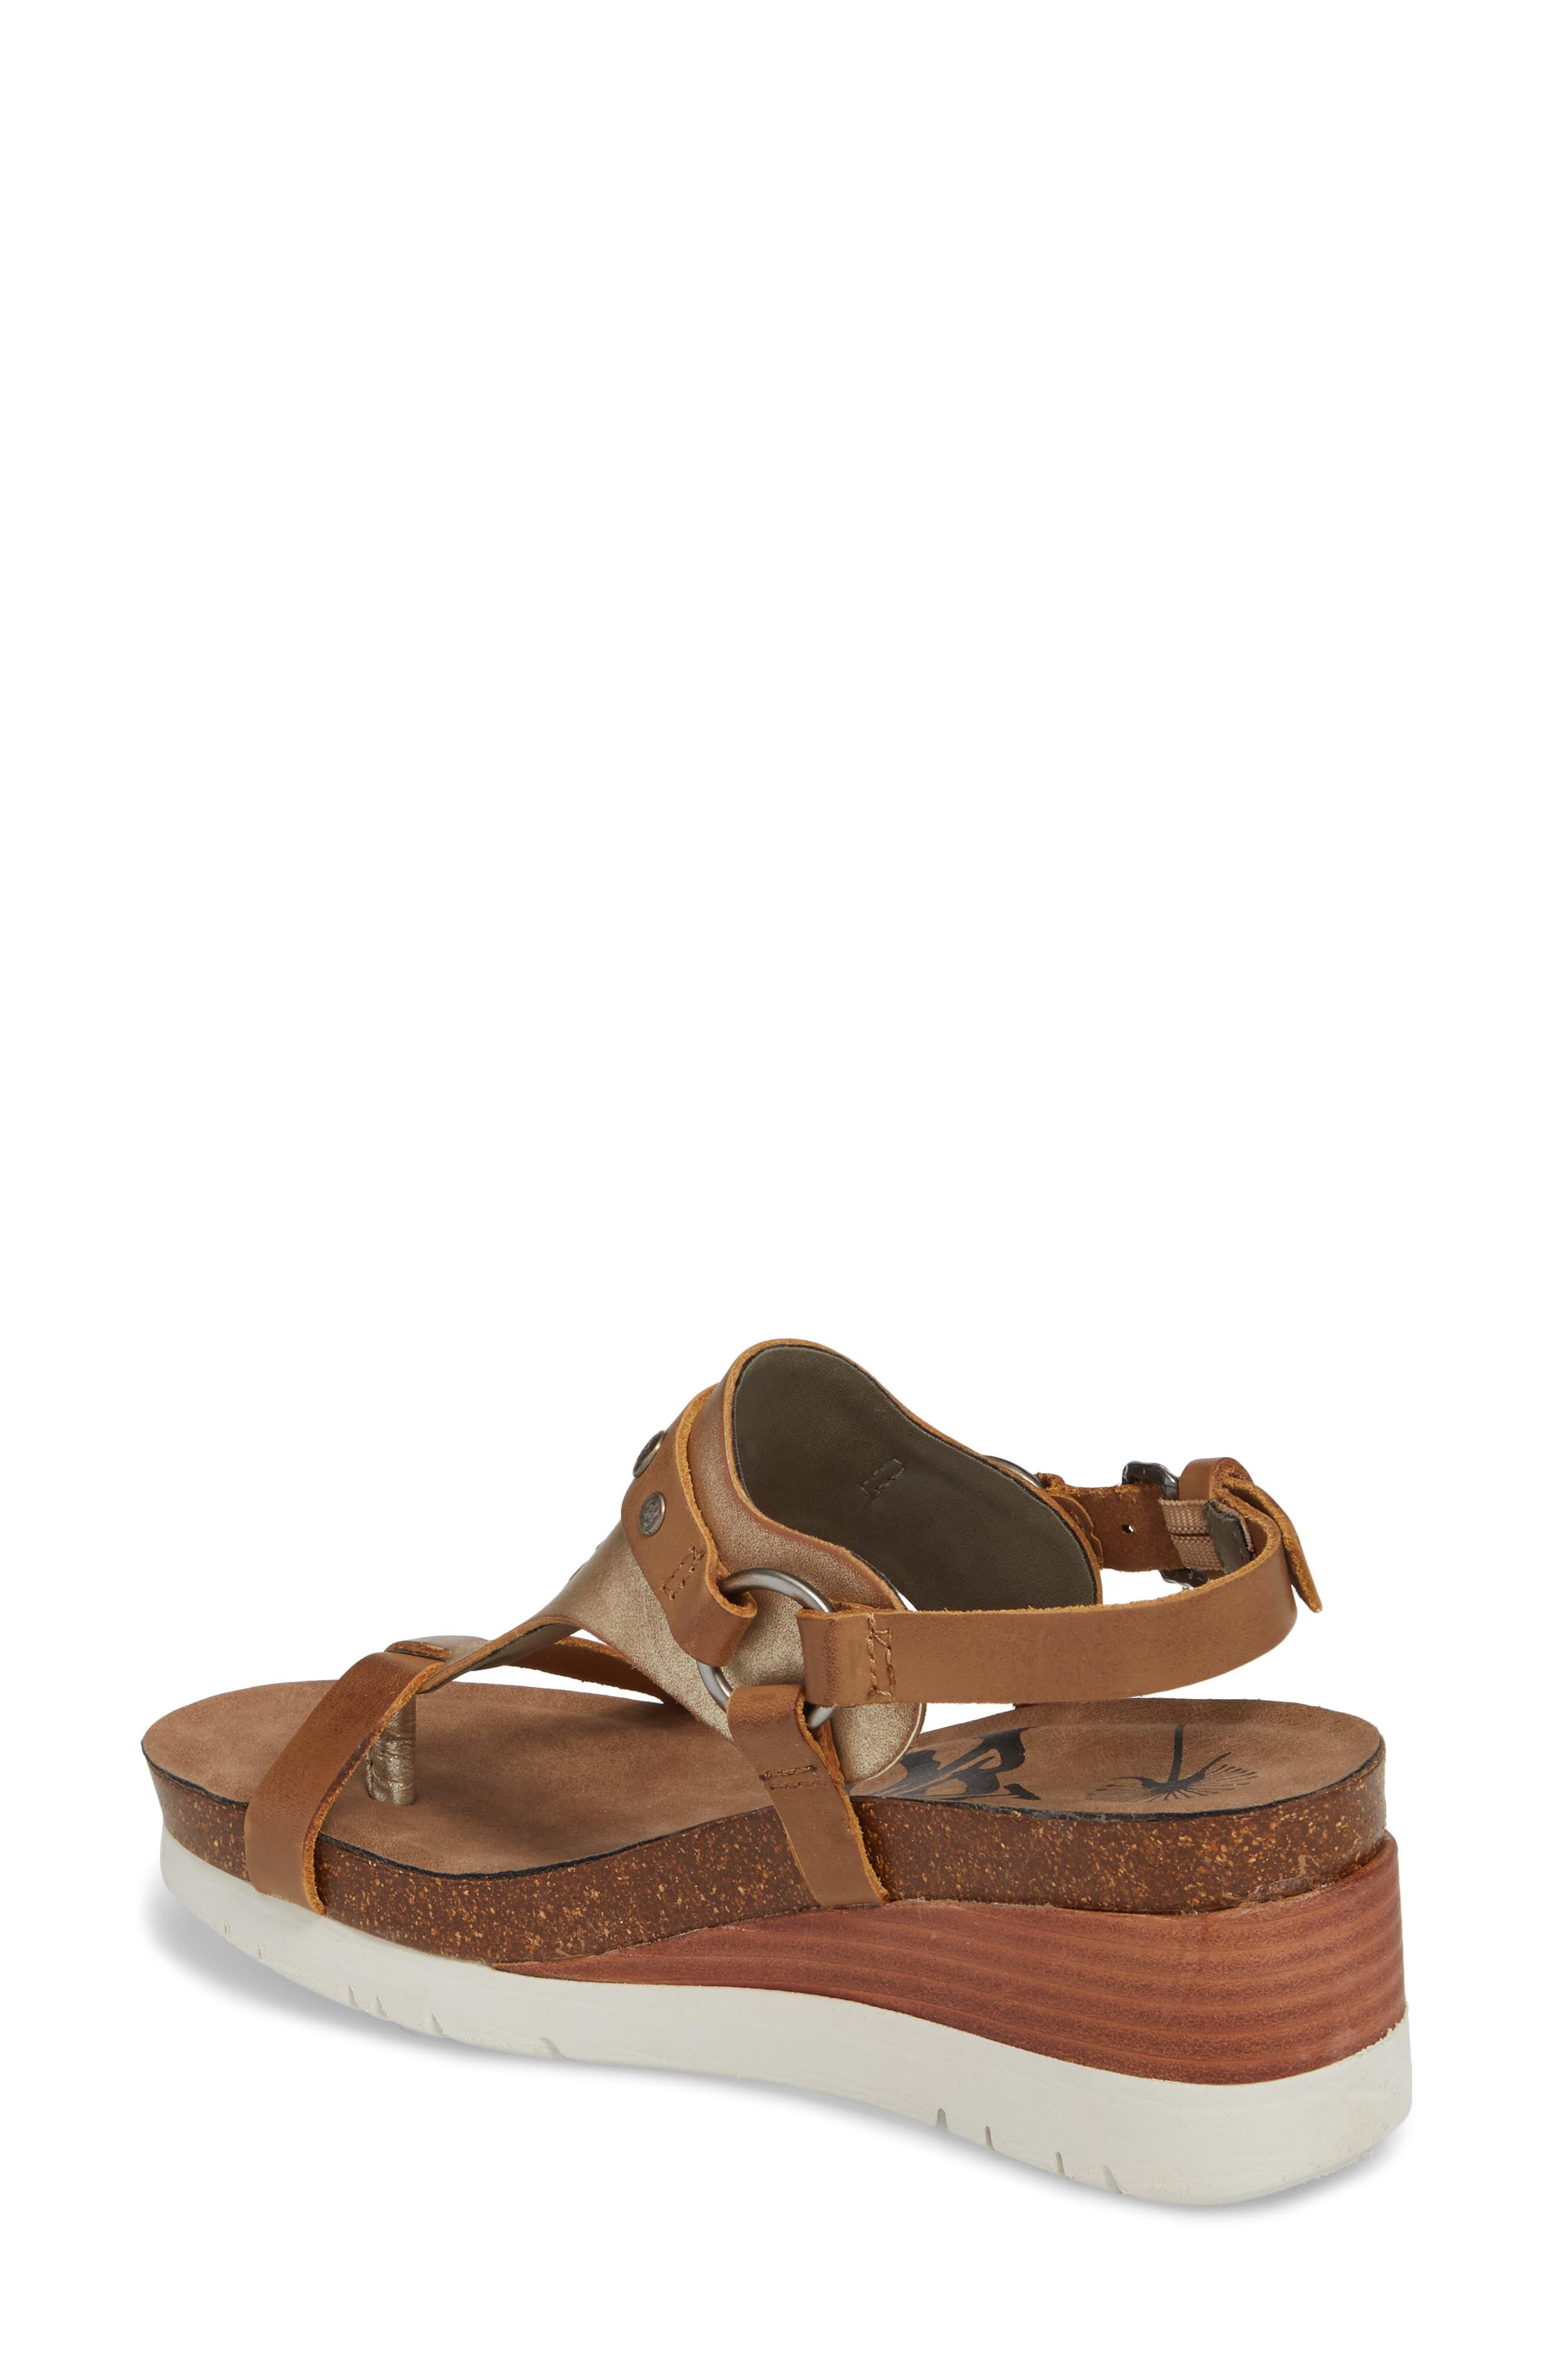 Maverick Wedge Sandal,                             Alternate thumbnail 2, color,                             New Taupe Leather